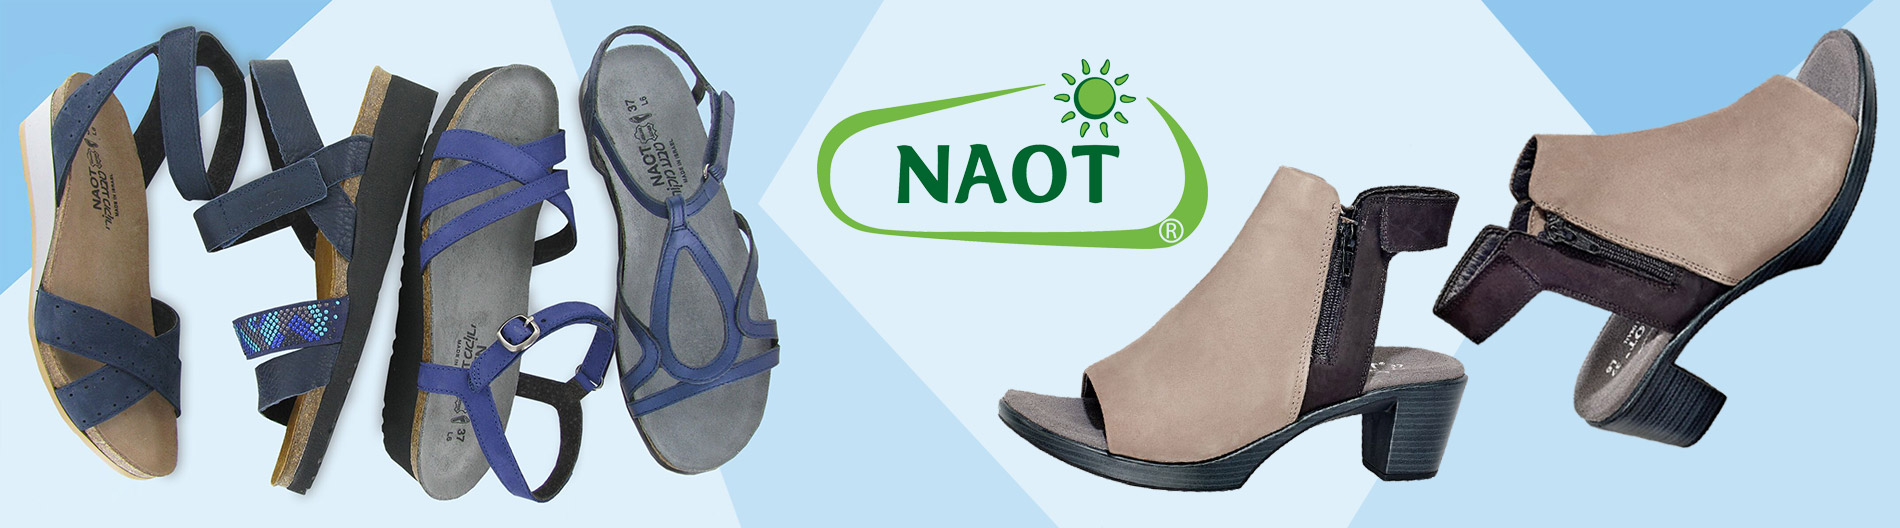 watch acee7 7498c Naot online footwear